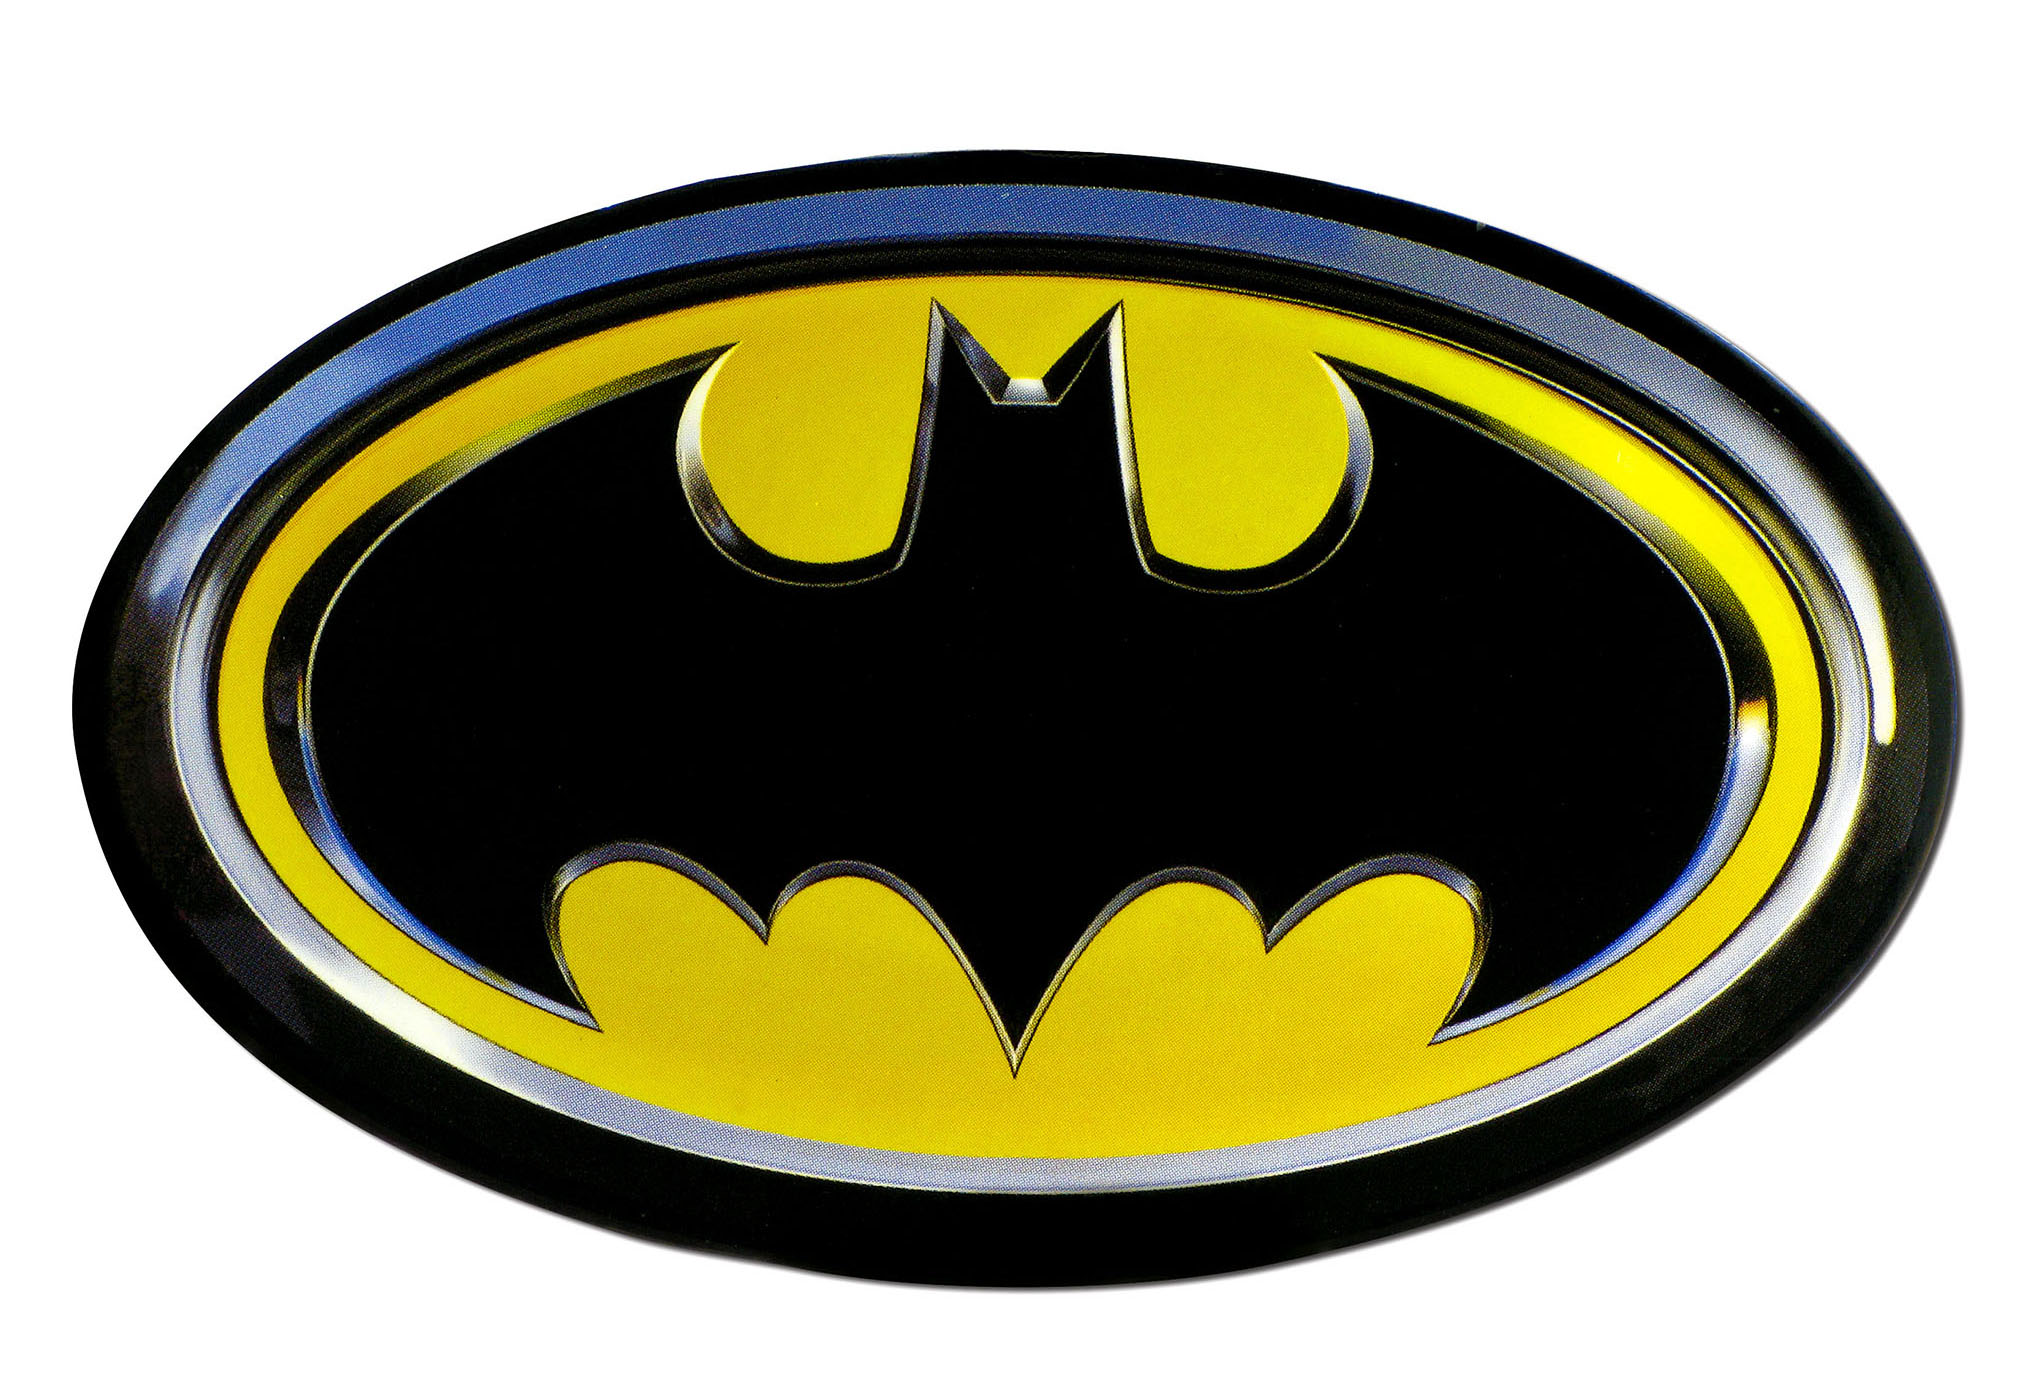 Images of batman symbol free download best images of batman 2036x1381 what39s your favorite batman symbol buycottarizona